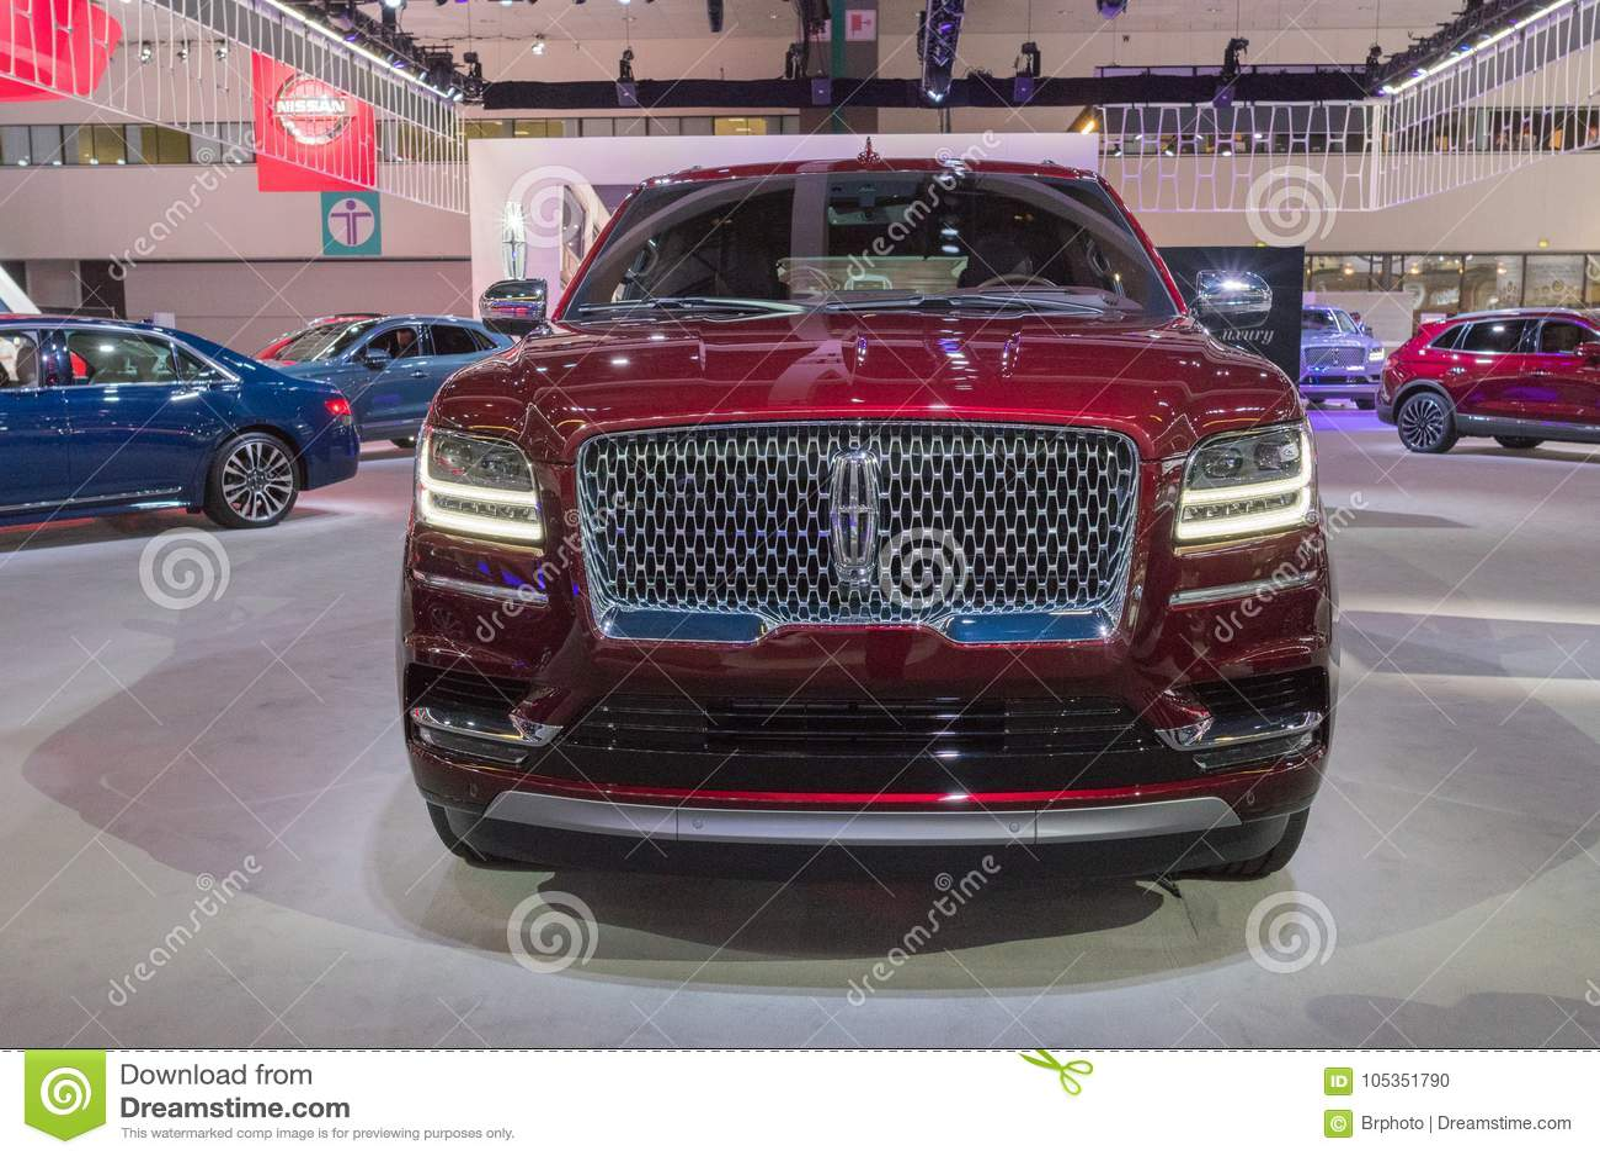 Honda Civic Hatchback On Display During LA Auto Show Editorial Image - Honda center car show